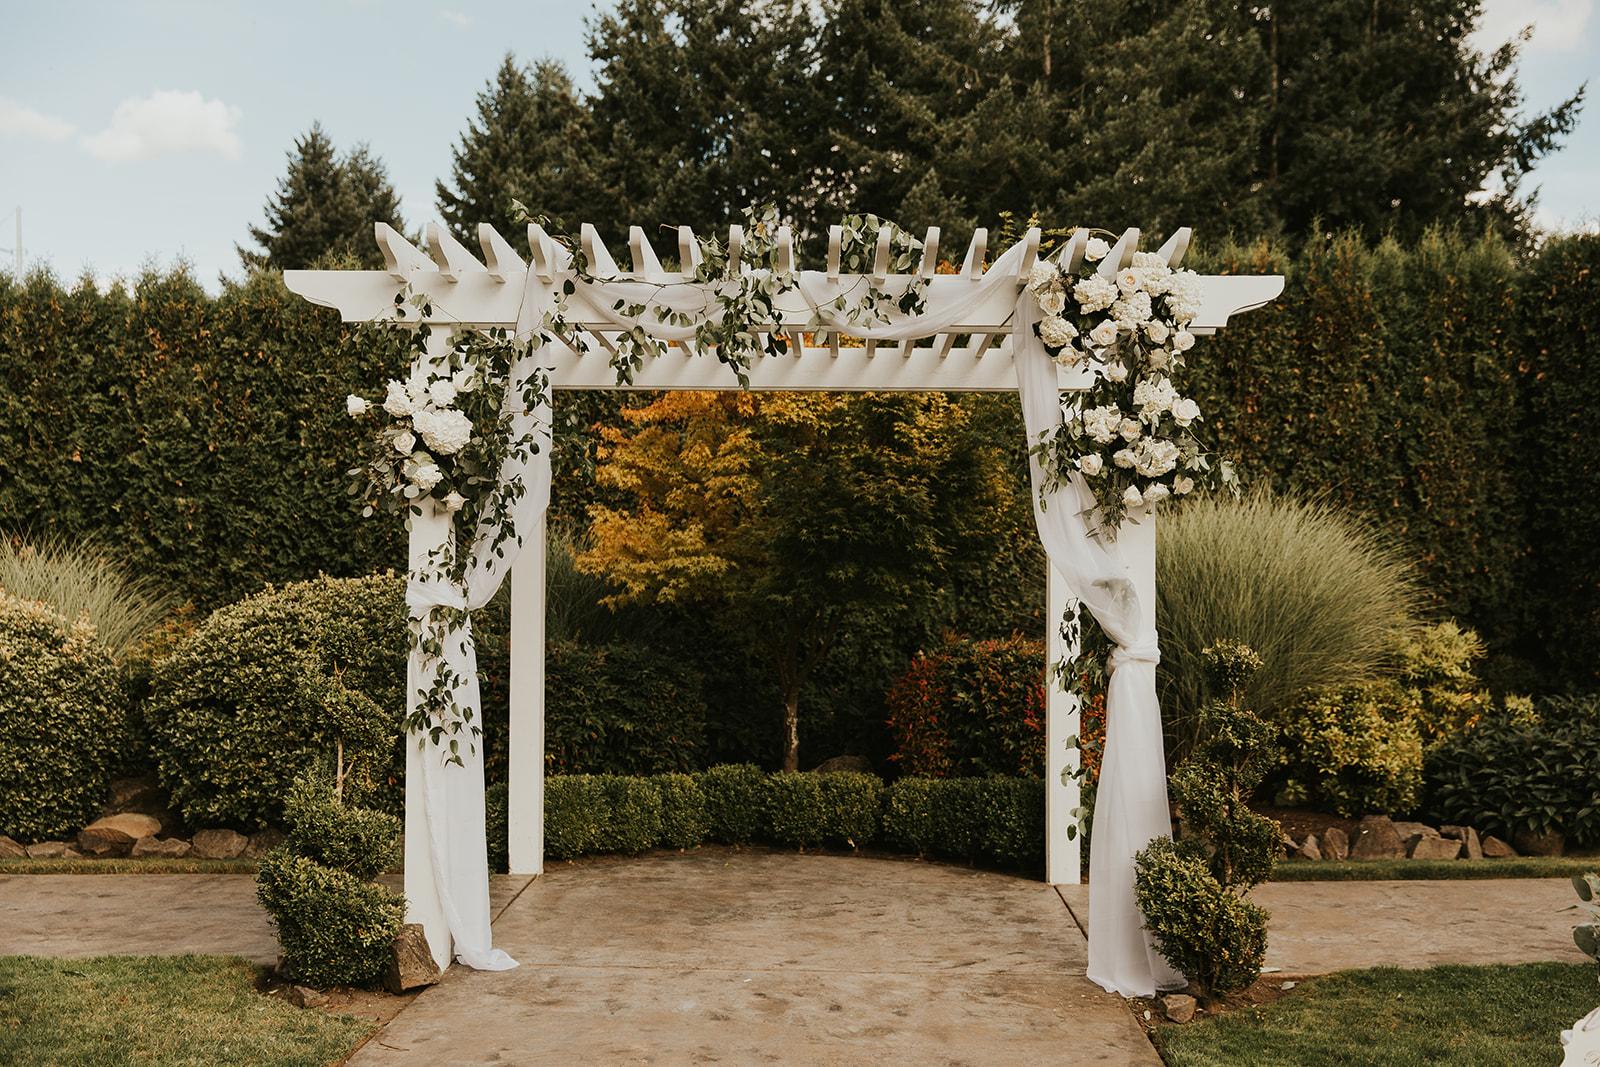 wedding arbor, classic wedding arbor, arbor decor, arch decor, floral installation, ceremony flowers, white and greenery florals, wedding flowers